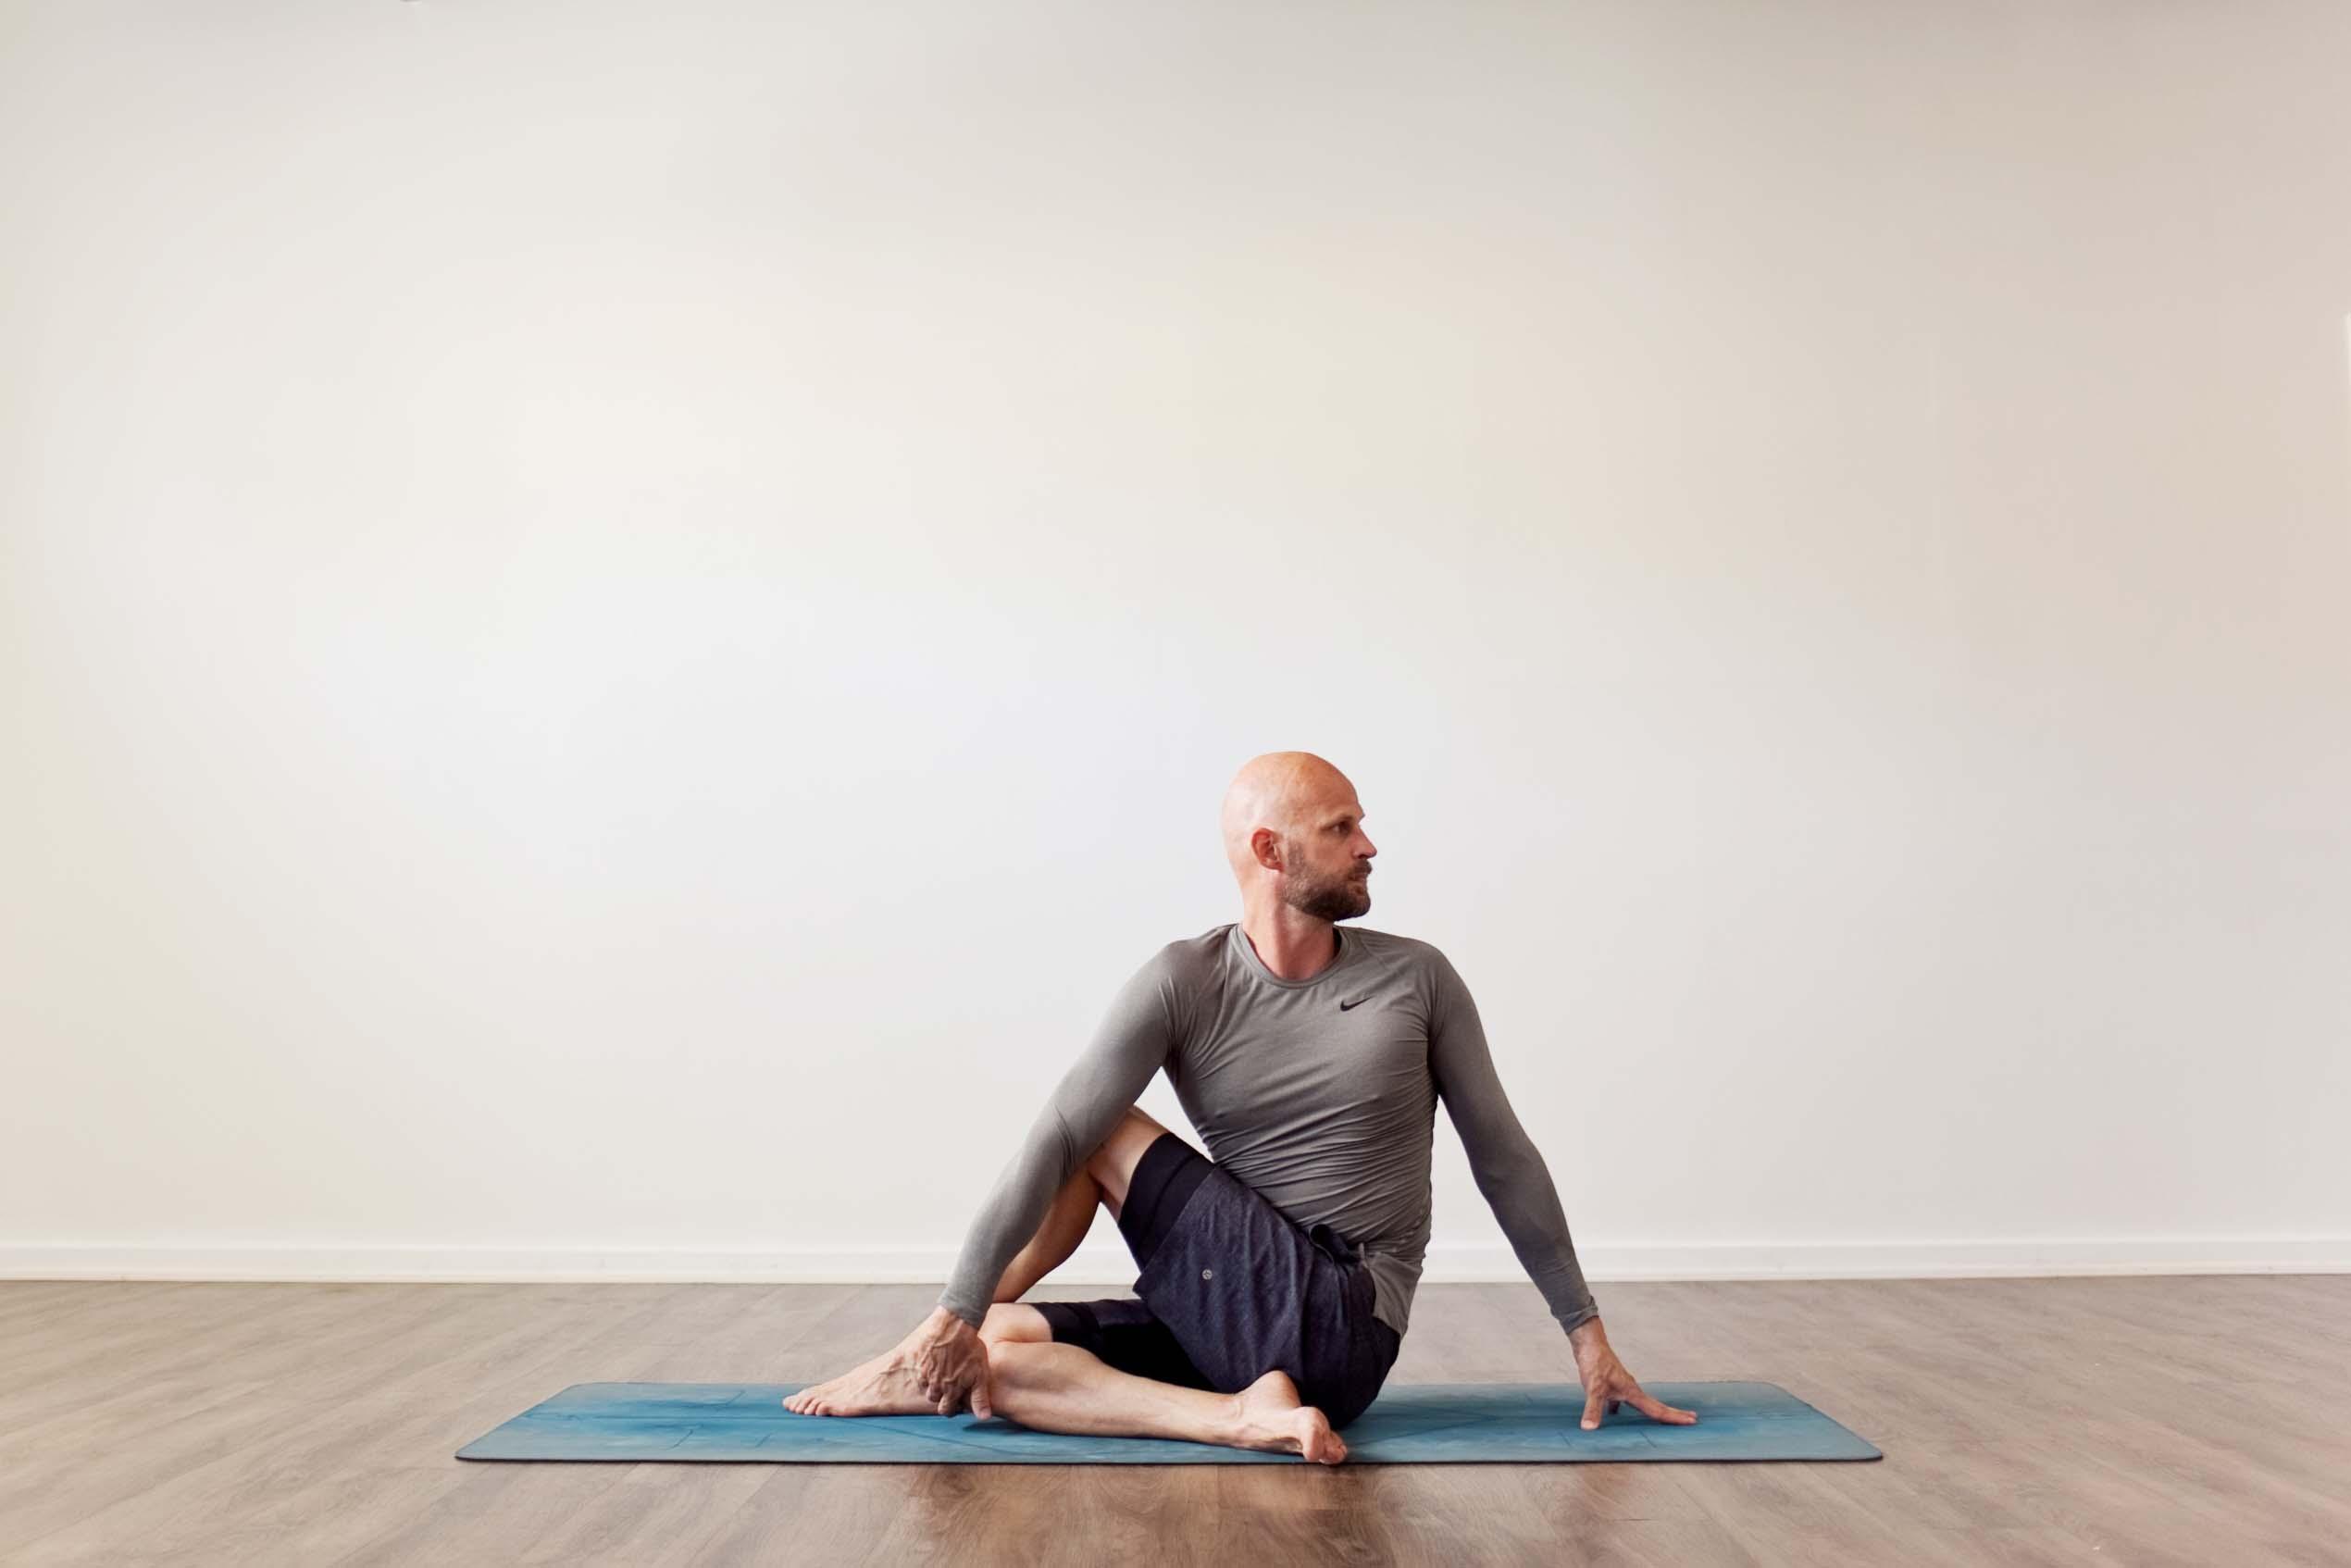 Ardha Matsyendrasana - Spine Twisting Pose